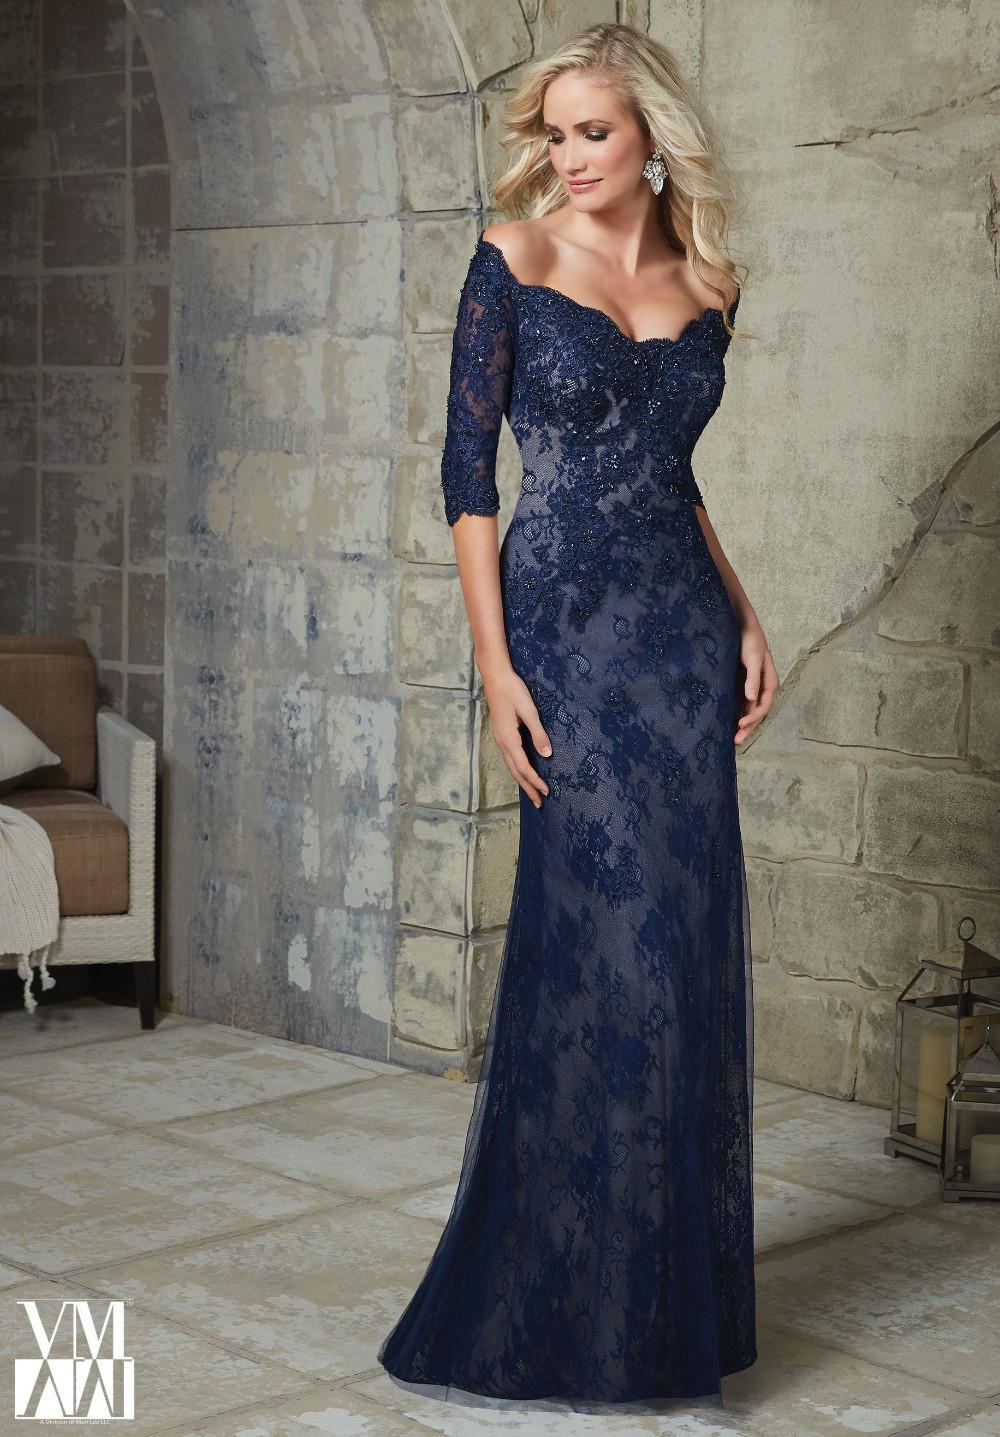 Elegant Plus Size Half Sleeve Plum Lace Mother of the Bride Dresses 2018 for Weddings appliques beading Mermaid Evening Dress